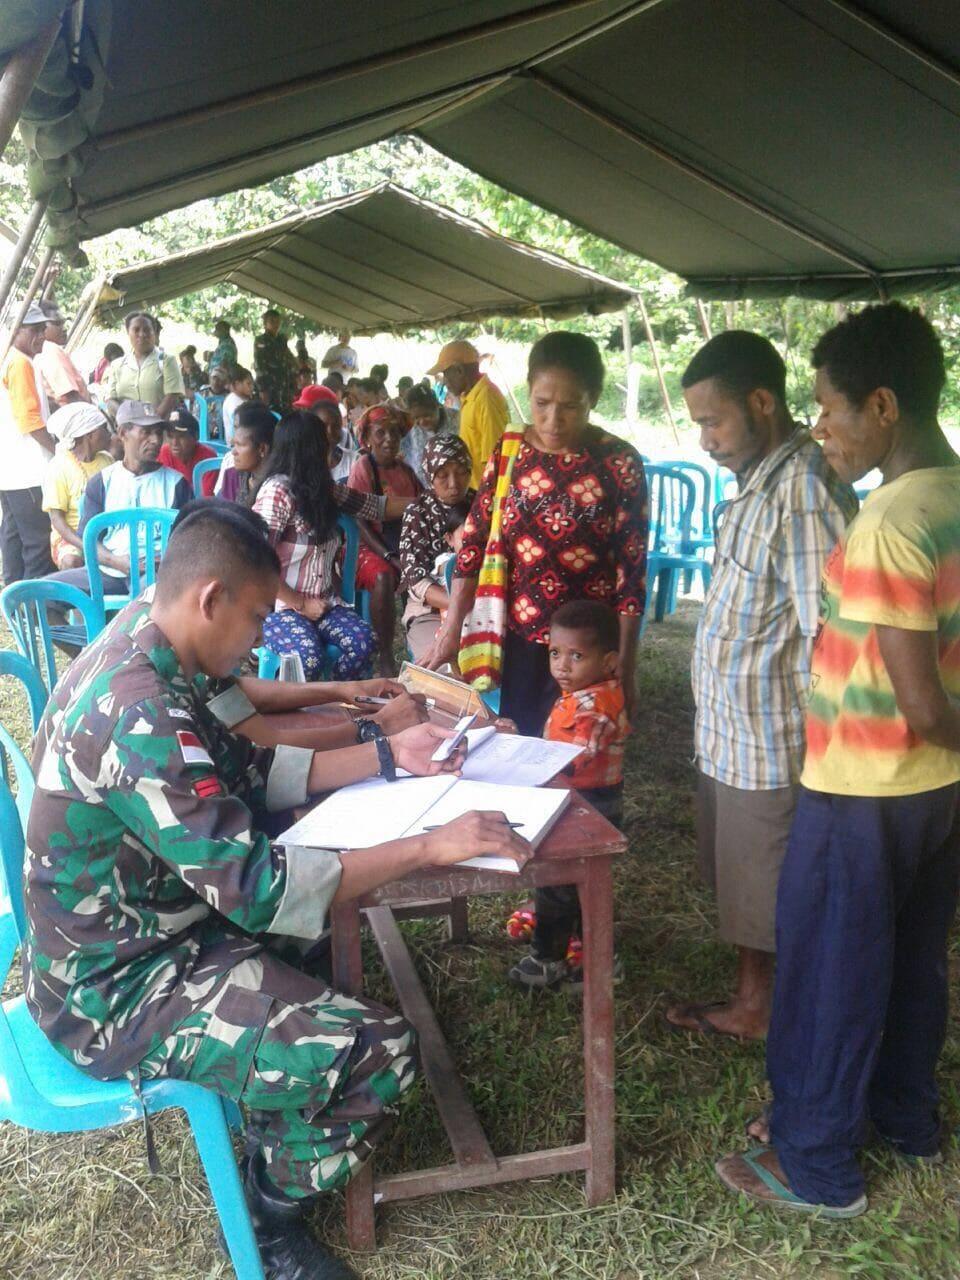 Satgas Pamtas Yl 431/Ssp Gelar Imunisasi Ibu Anak Di Kp. Kalipay Bersama Puskesmas Pembantu